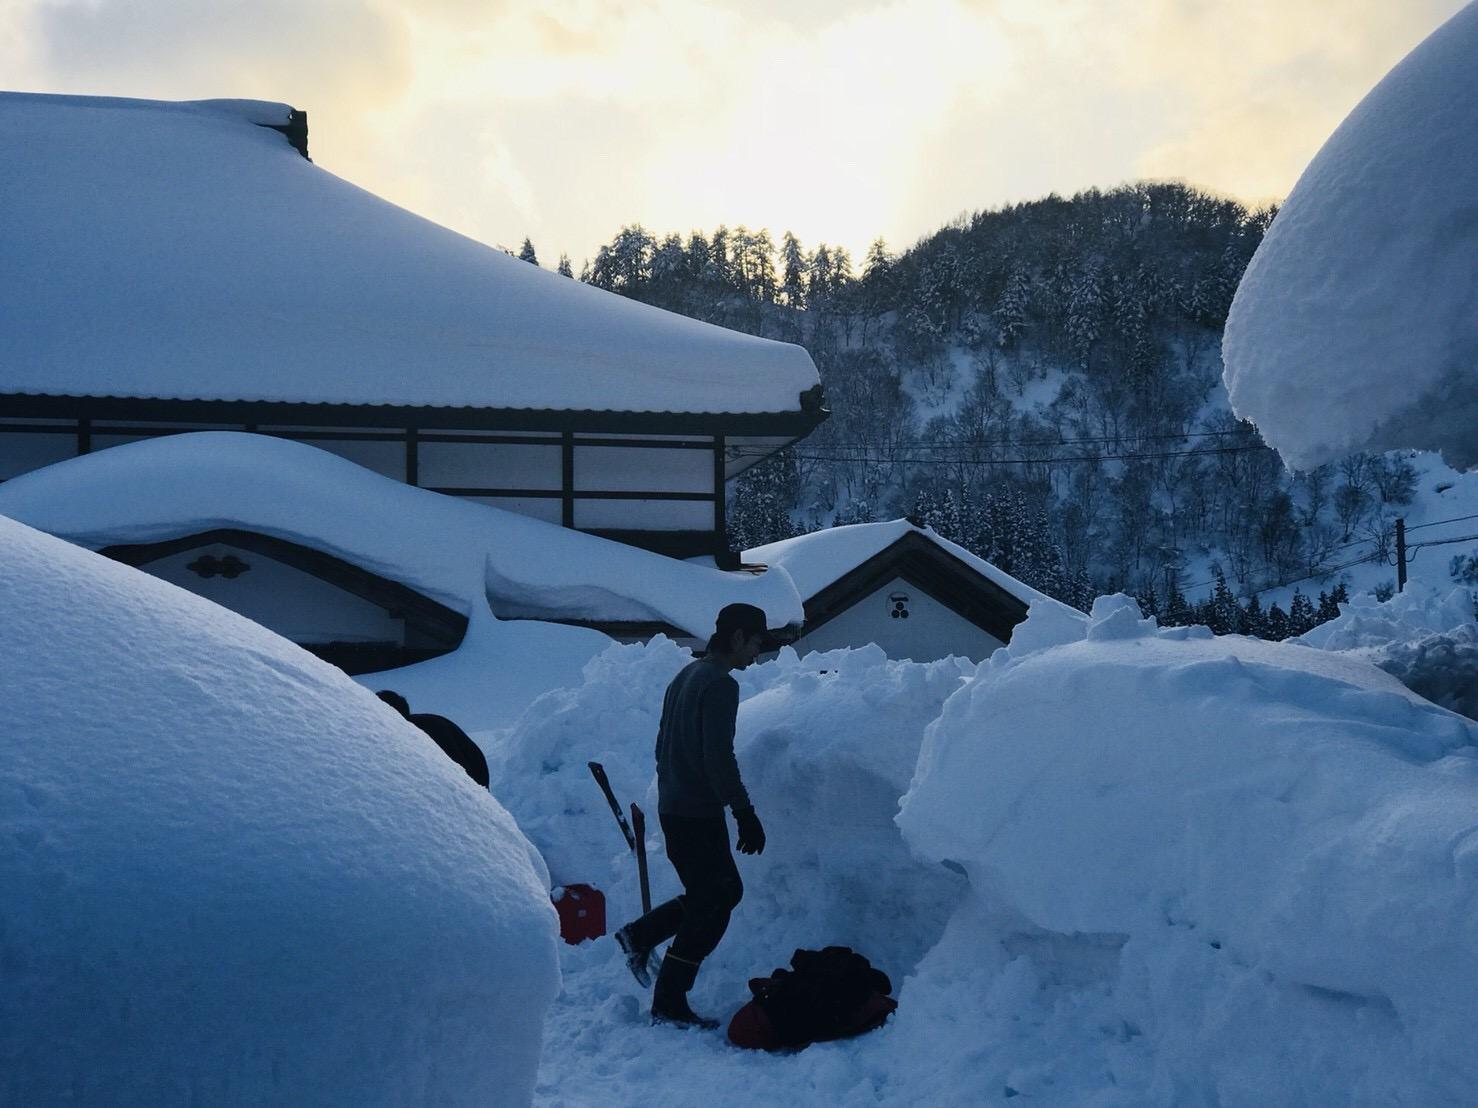 福島県昭和村の雪